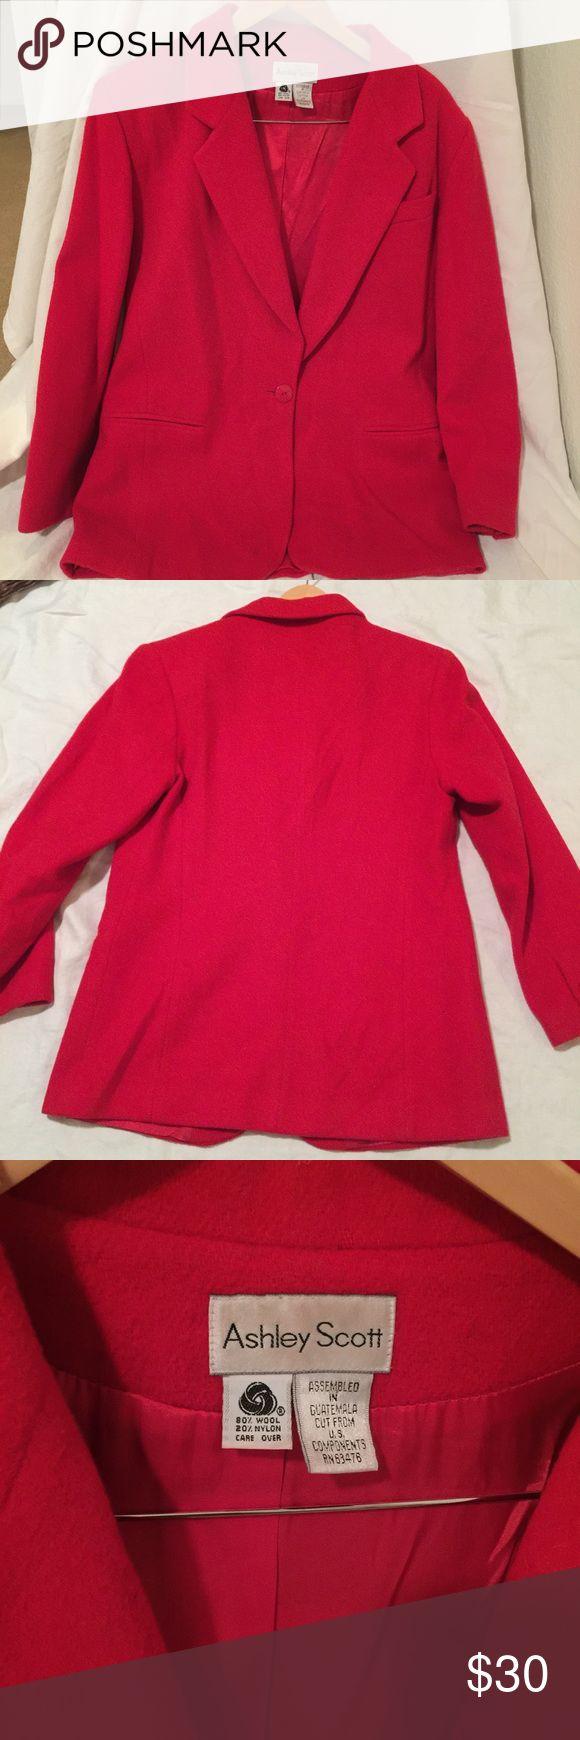 Vintage Ashley Scott Red Wool Blazer Medium Preloved and in great condition! Ashley Scott Jackets & Coats Blazers